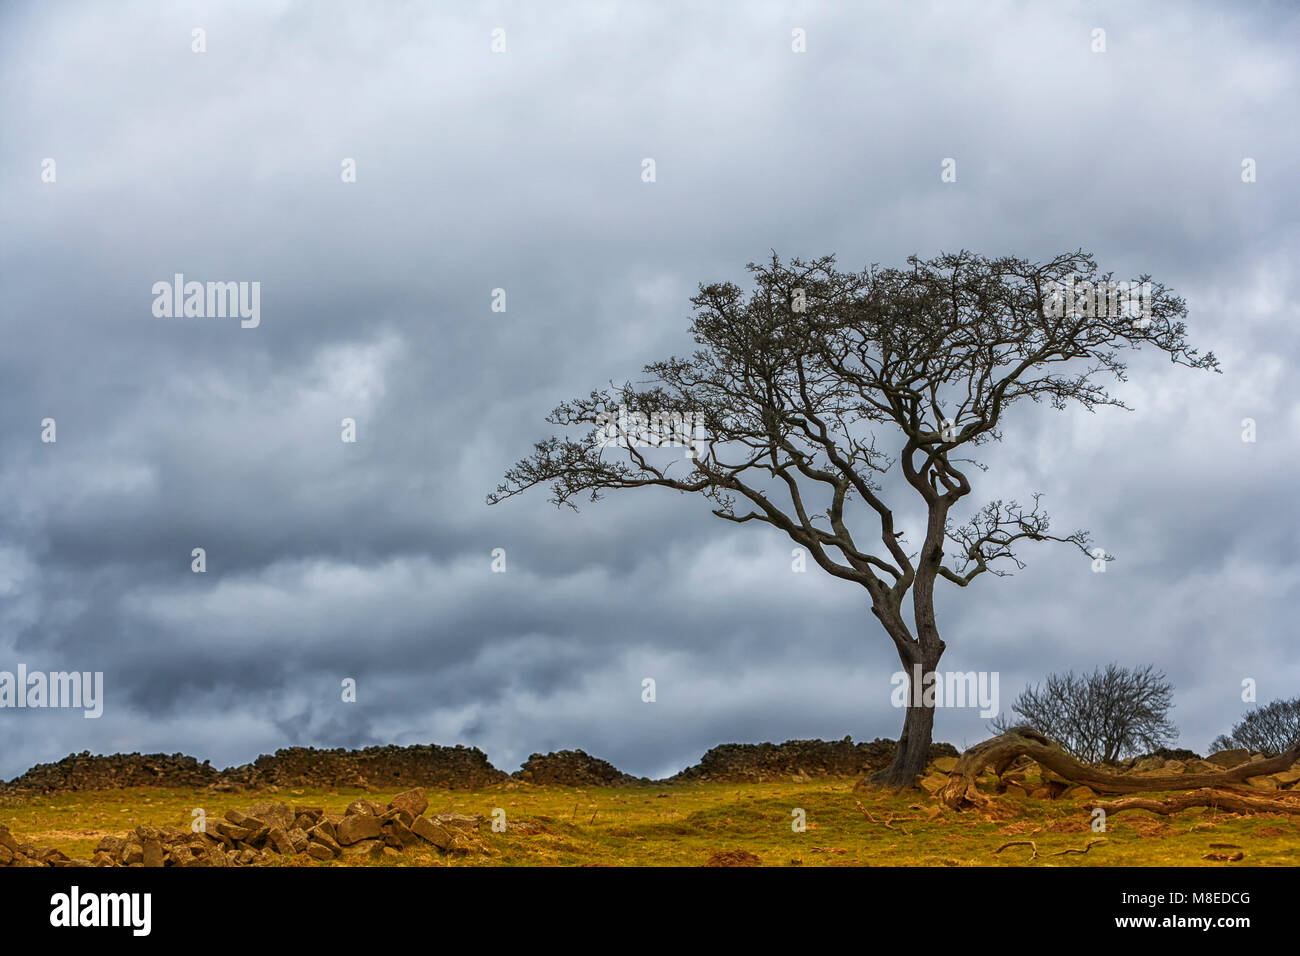 Hawthorn Tree on moorland with heavy rain clouds overhead - Stock Image